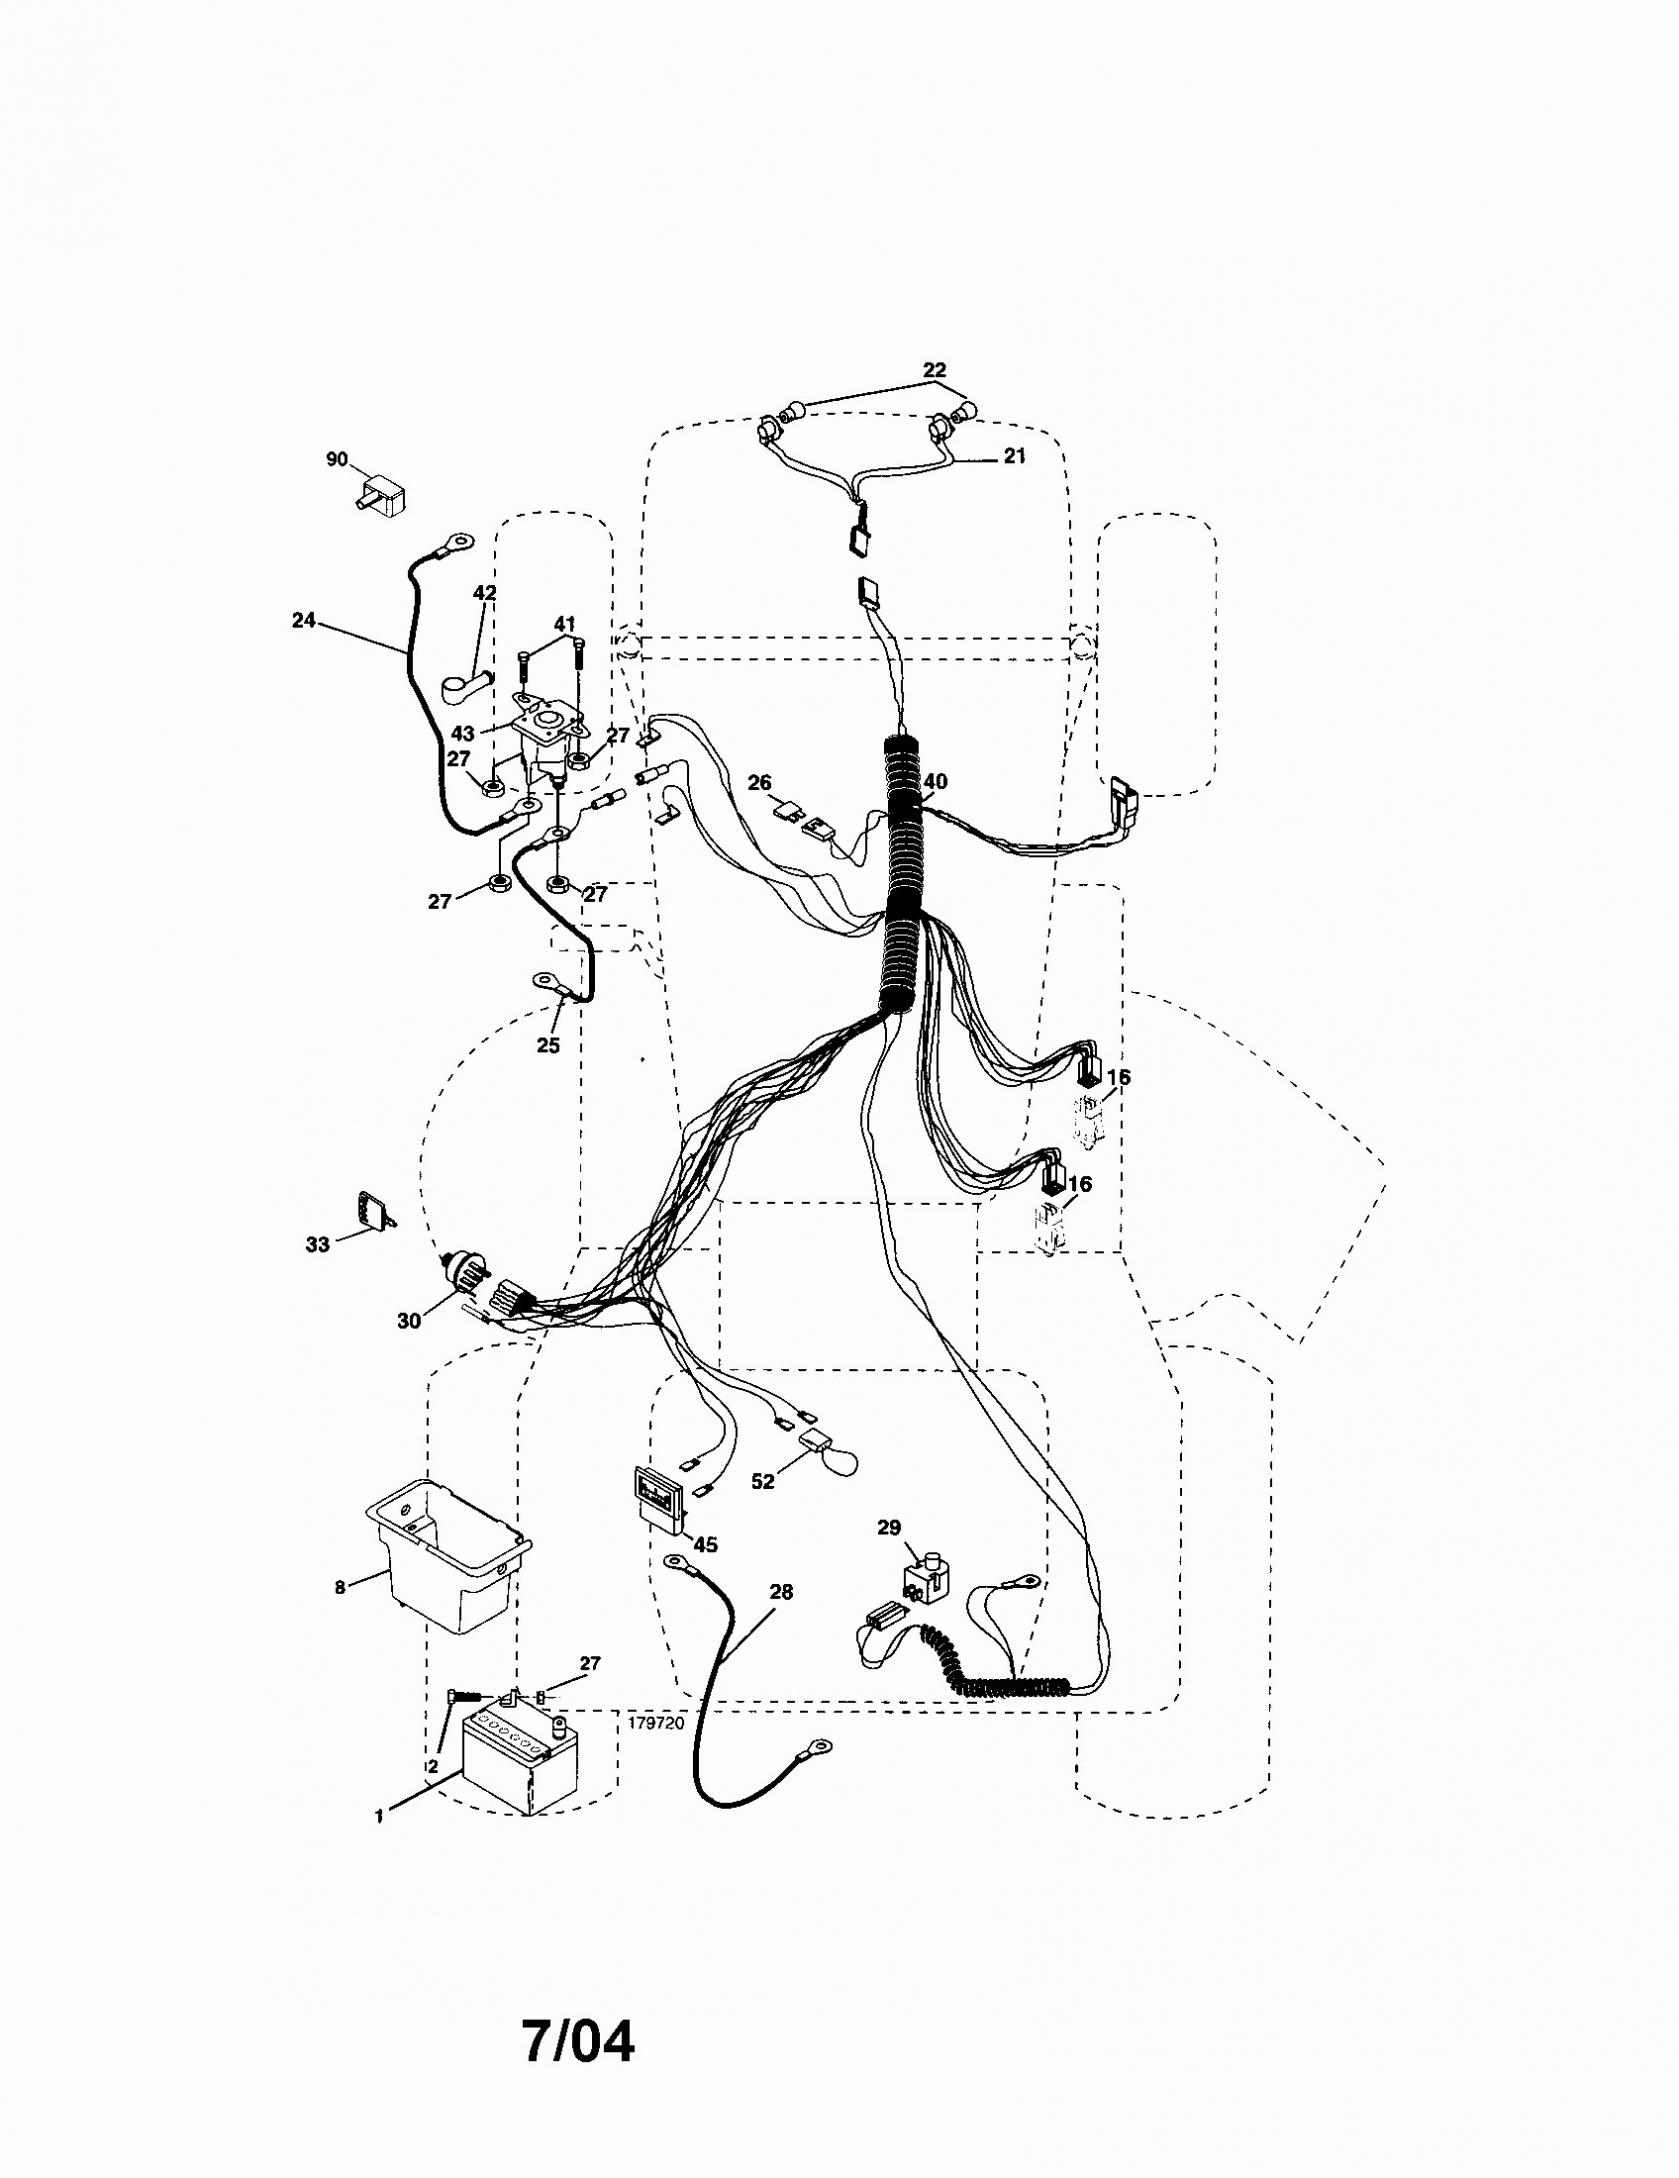 Briggs And Stratton V Twin Wiring Diagram